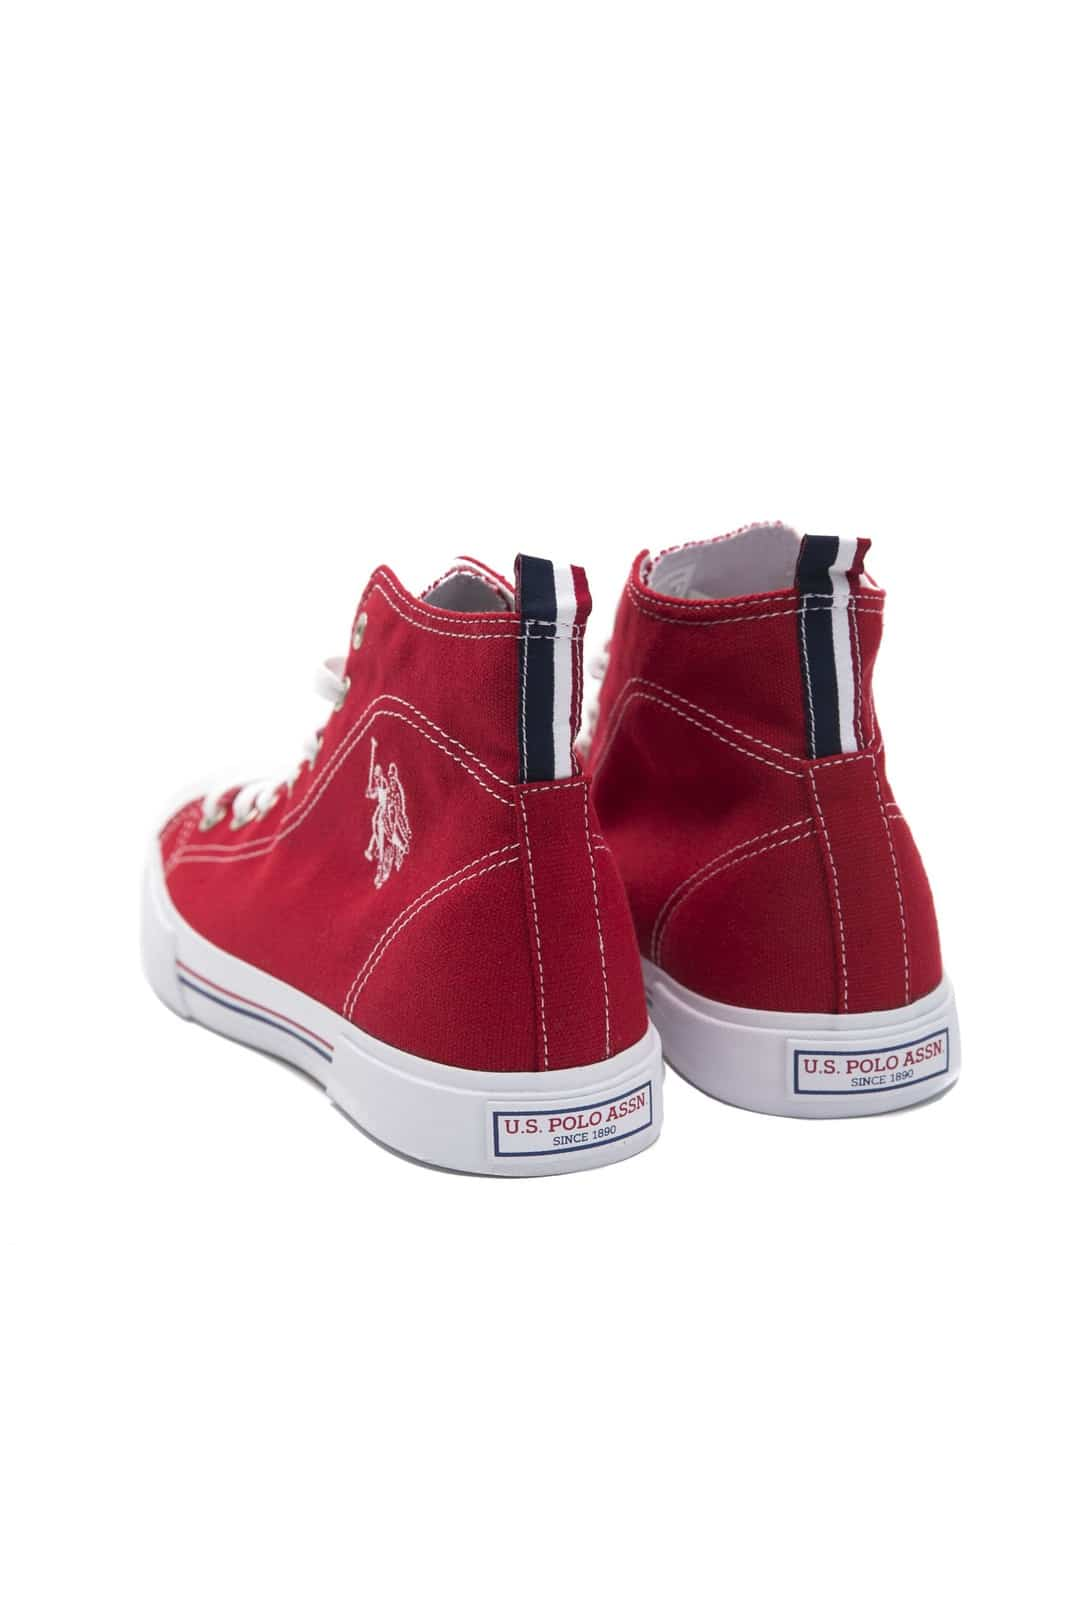 chaussure Converse us polo assn,chaussures Converse